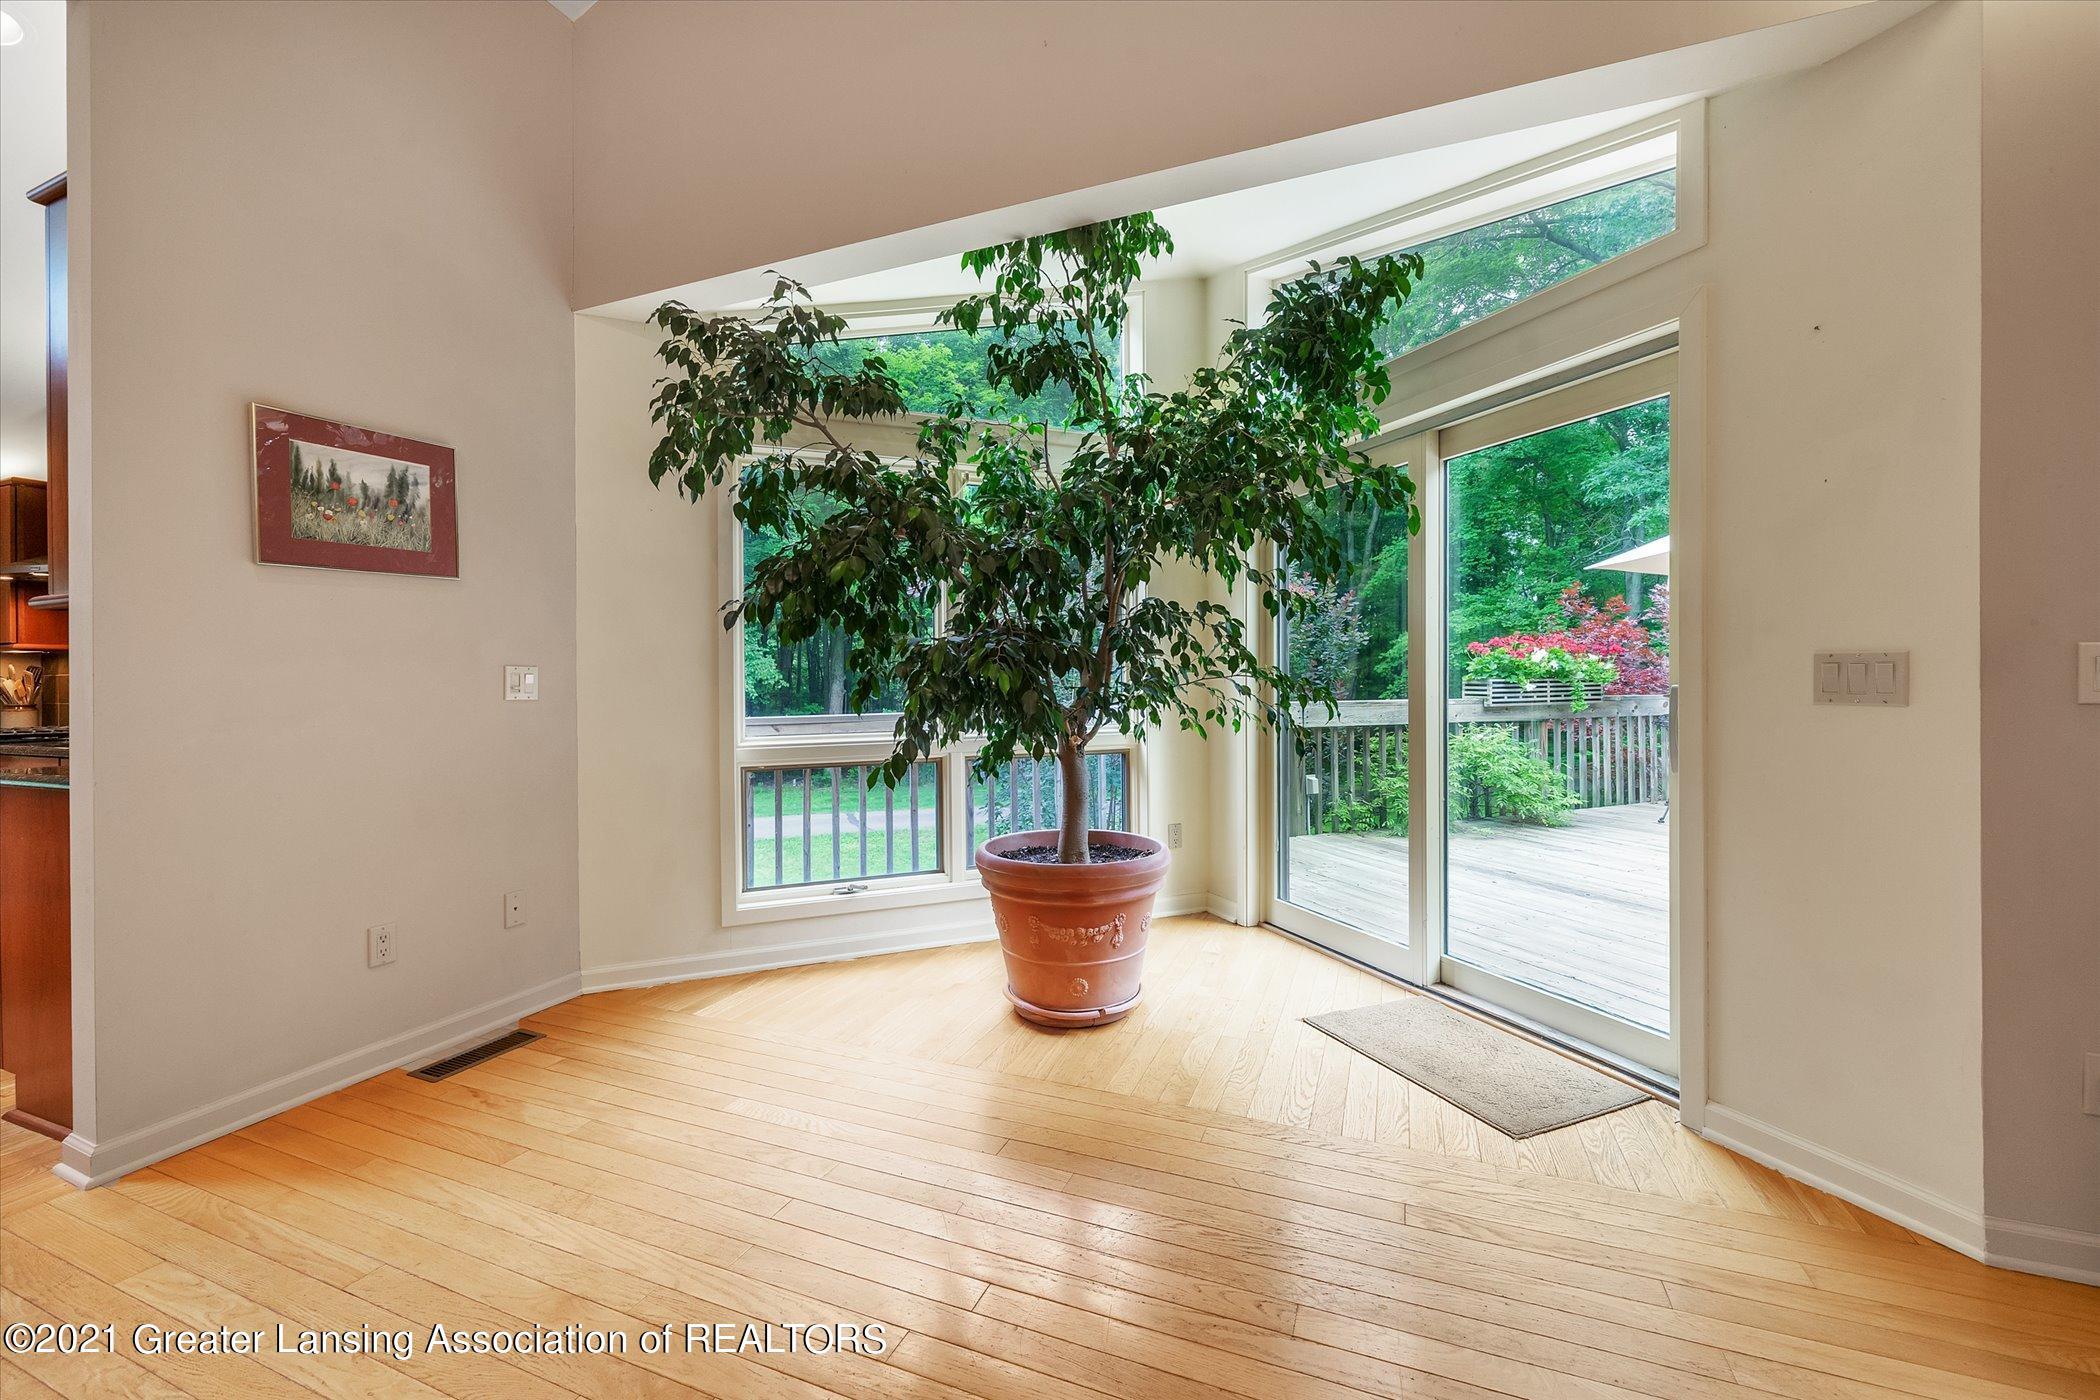 442 Shoesmith Rd - (11) MAIN FLOOR Living Room - 12